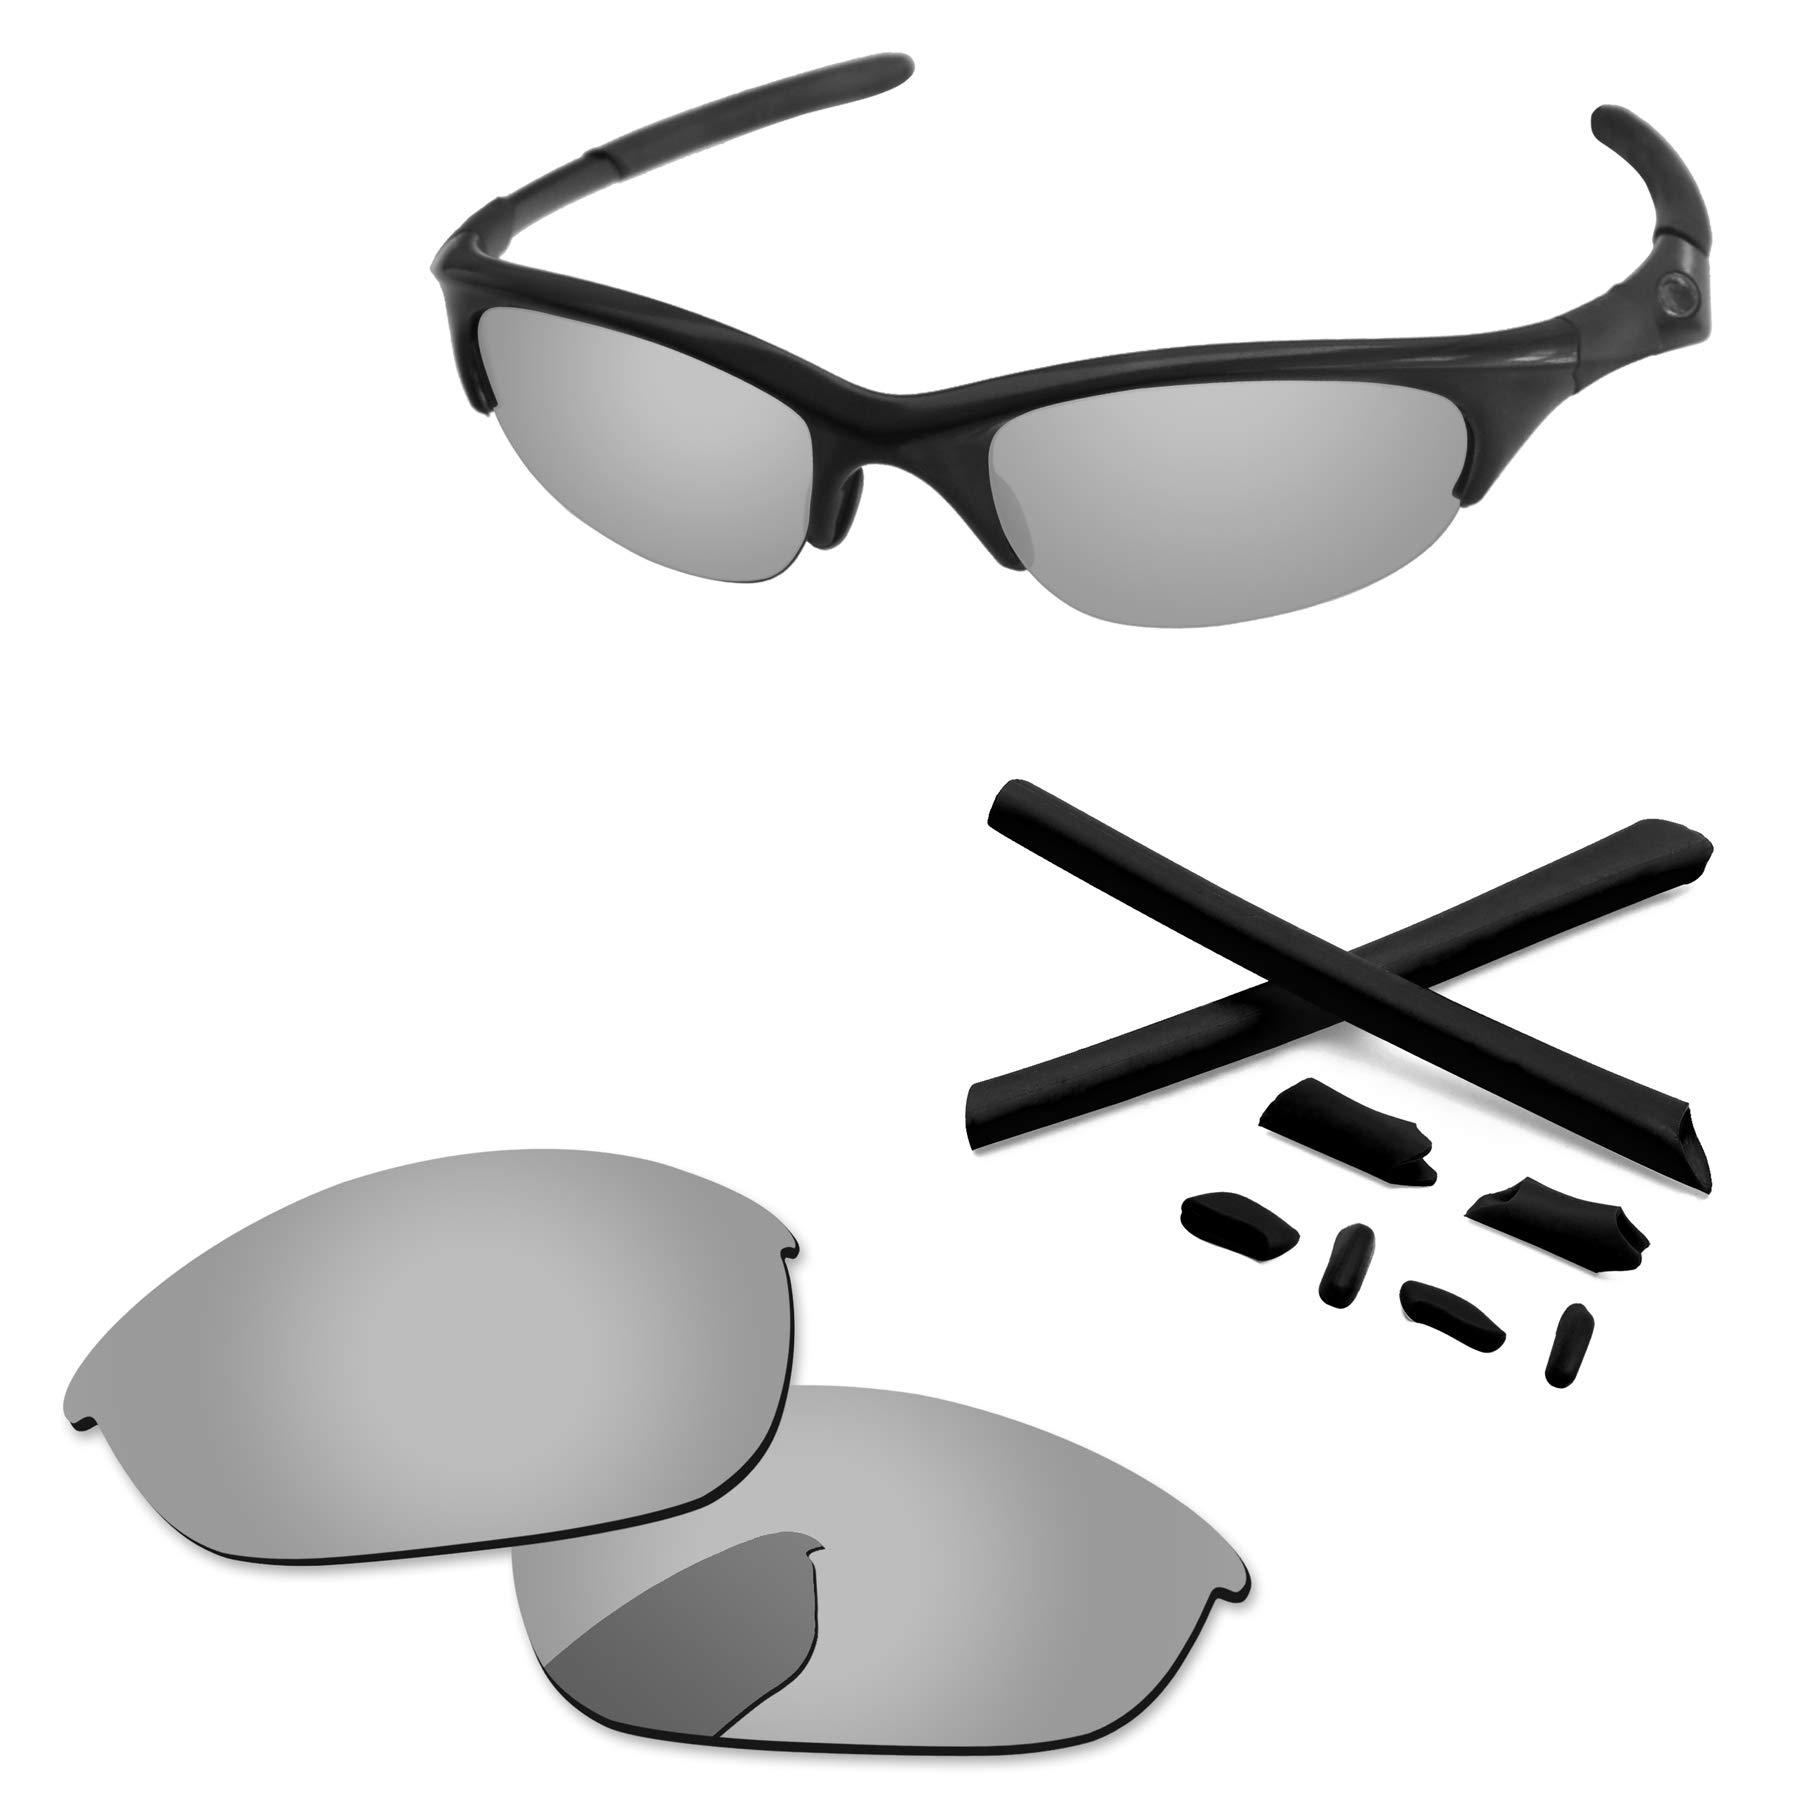 PapaViva Lenses Replacement & Rubber Kits for Oakley Half Jacket